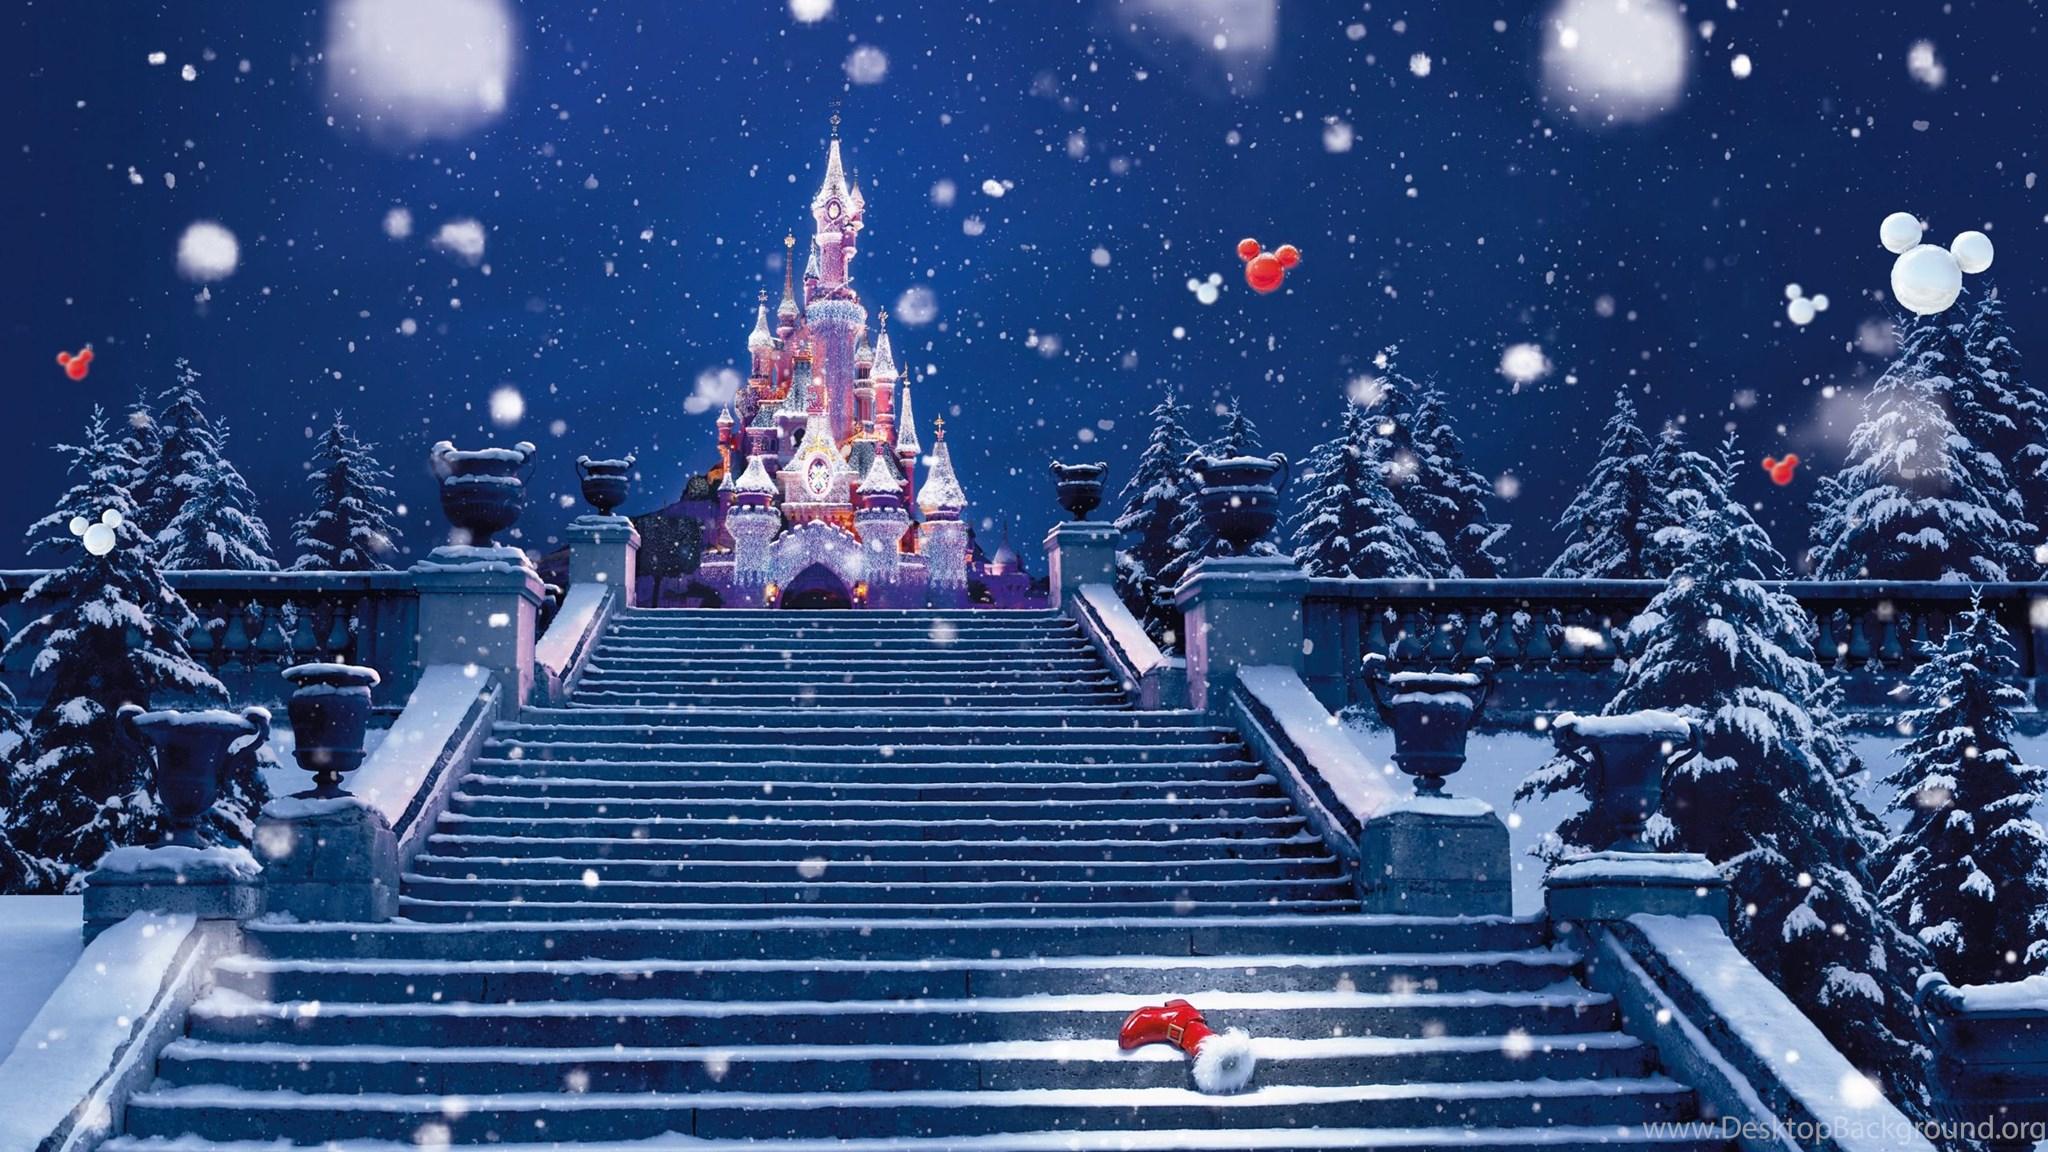 Christmas At Disney World Wallpapers 28359 Desktop Background